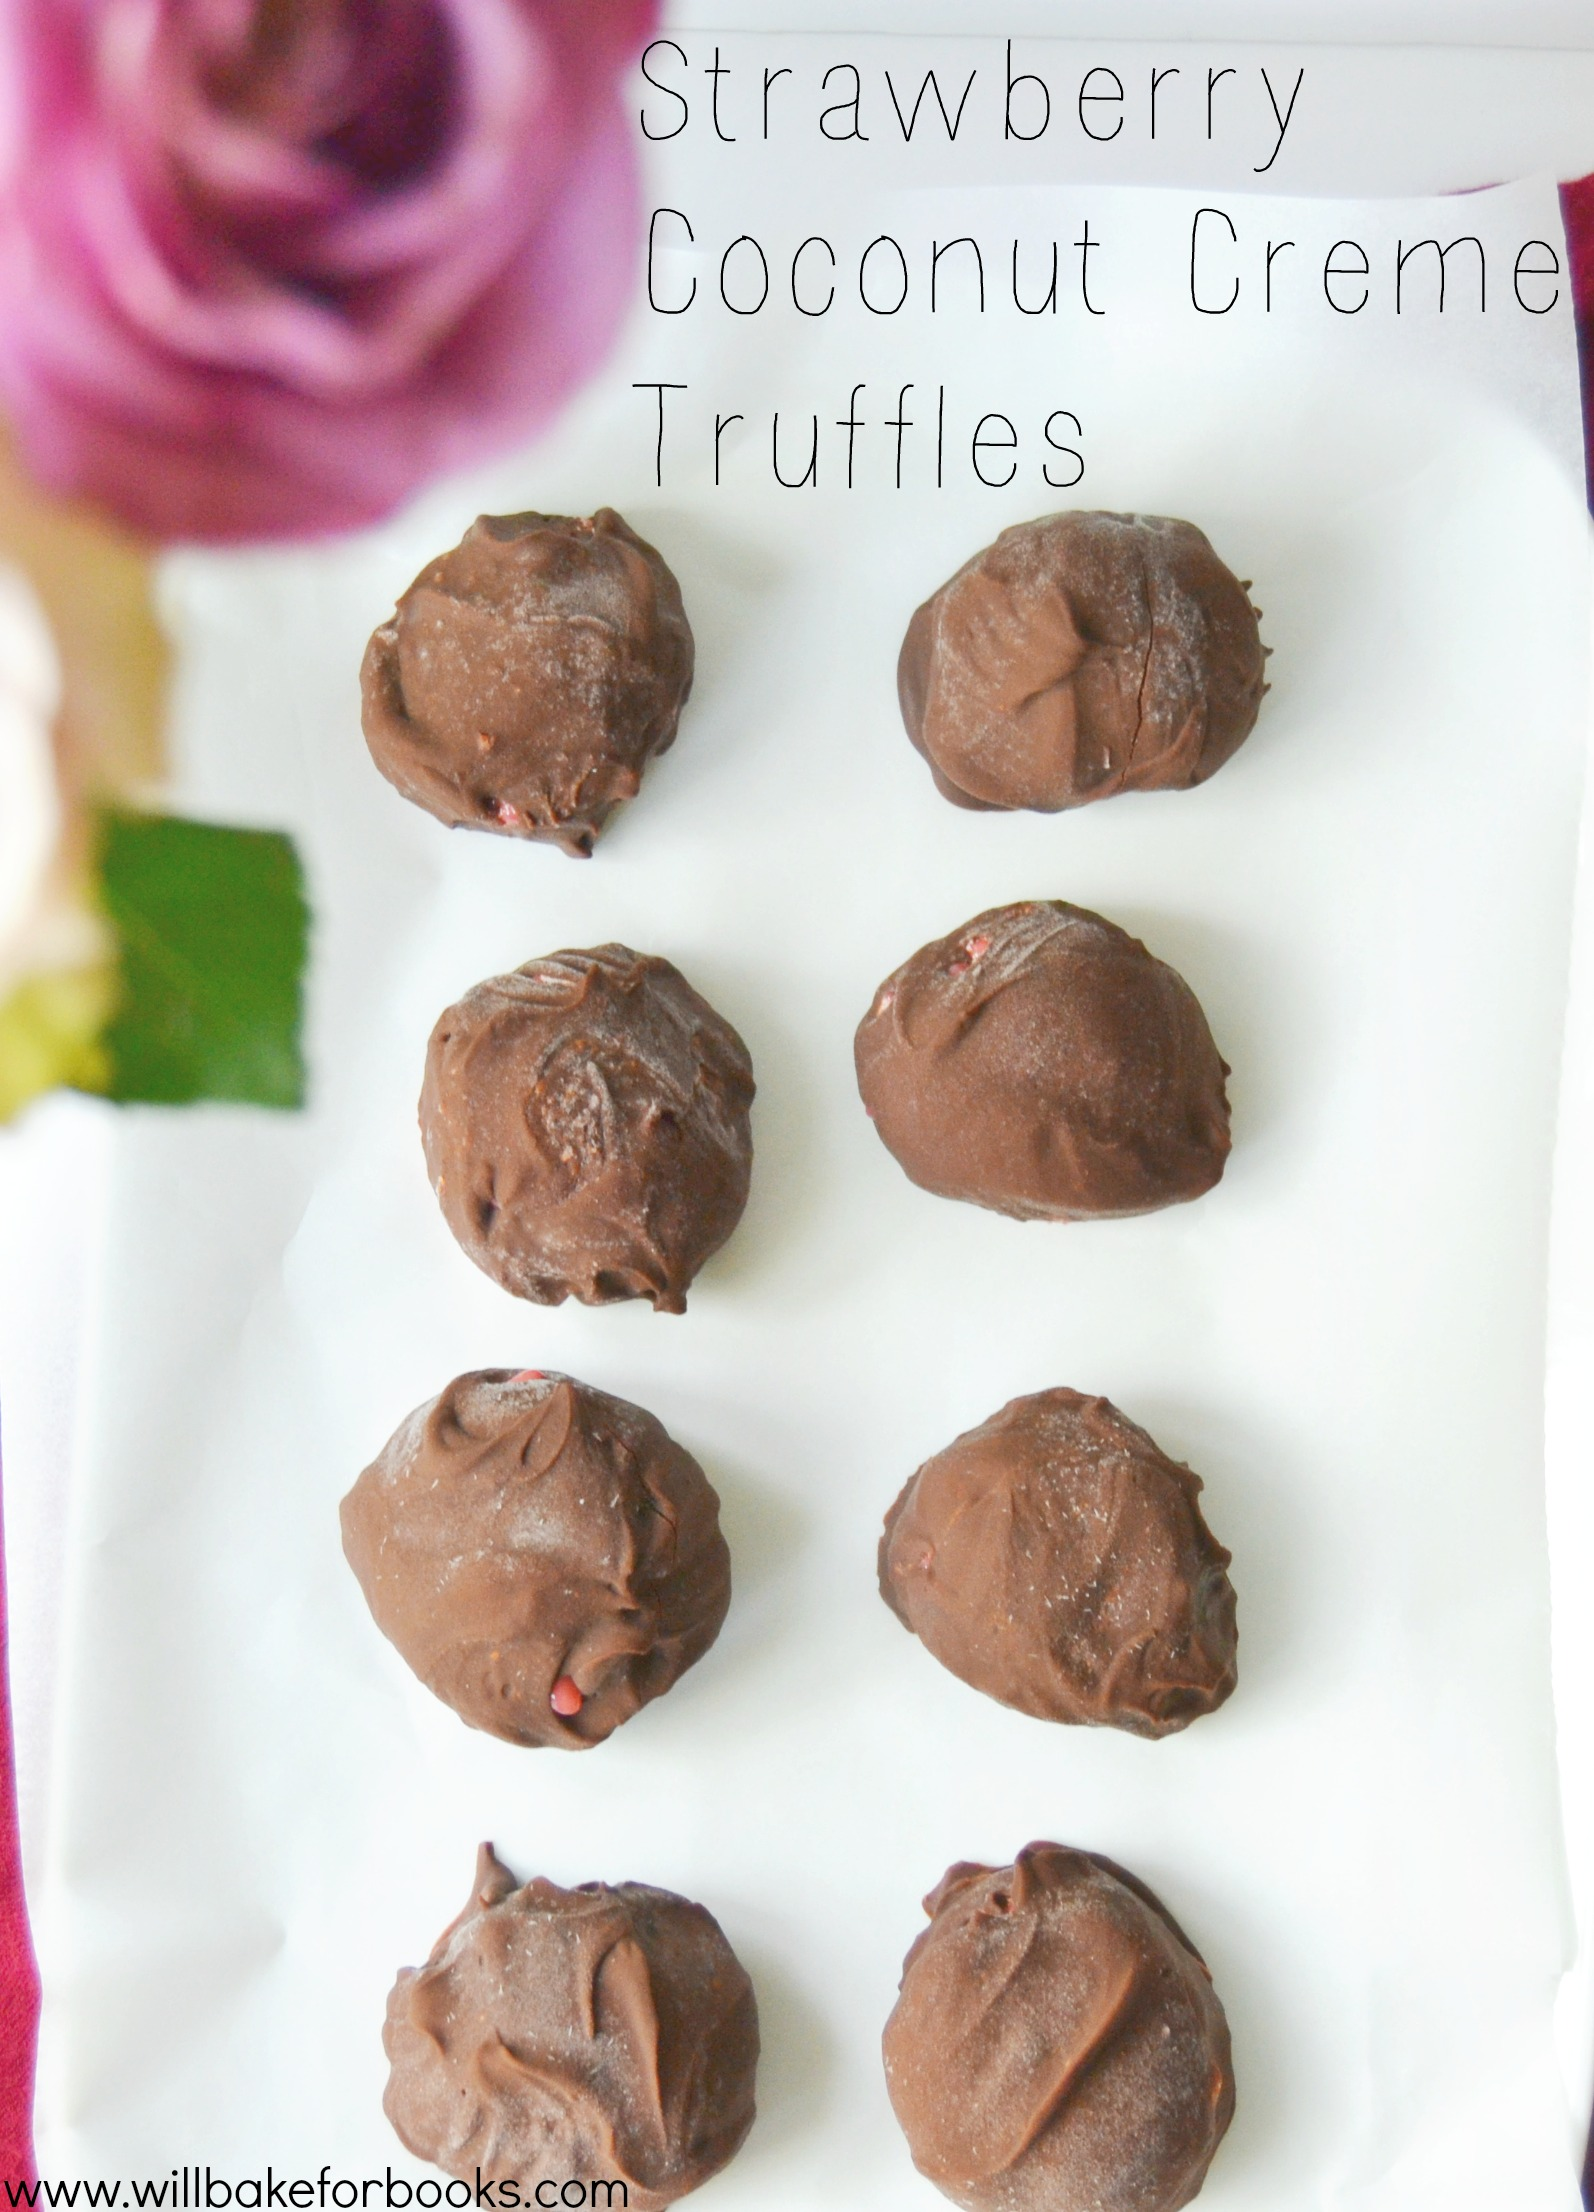 Simple Strawberry Coconut Creme Truffles | Find the recipe on willbakeforbooks.com! #vegan #glutenfree #grainfree #paleo